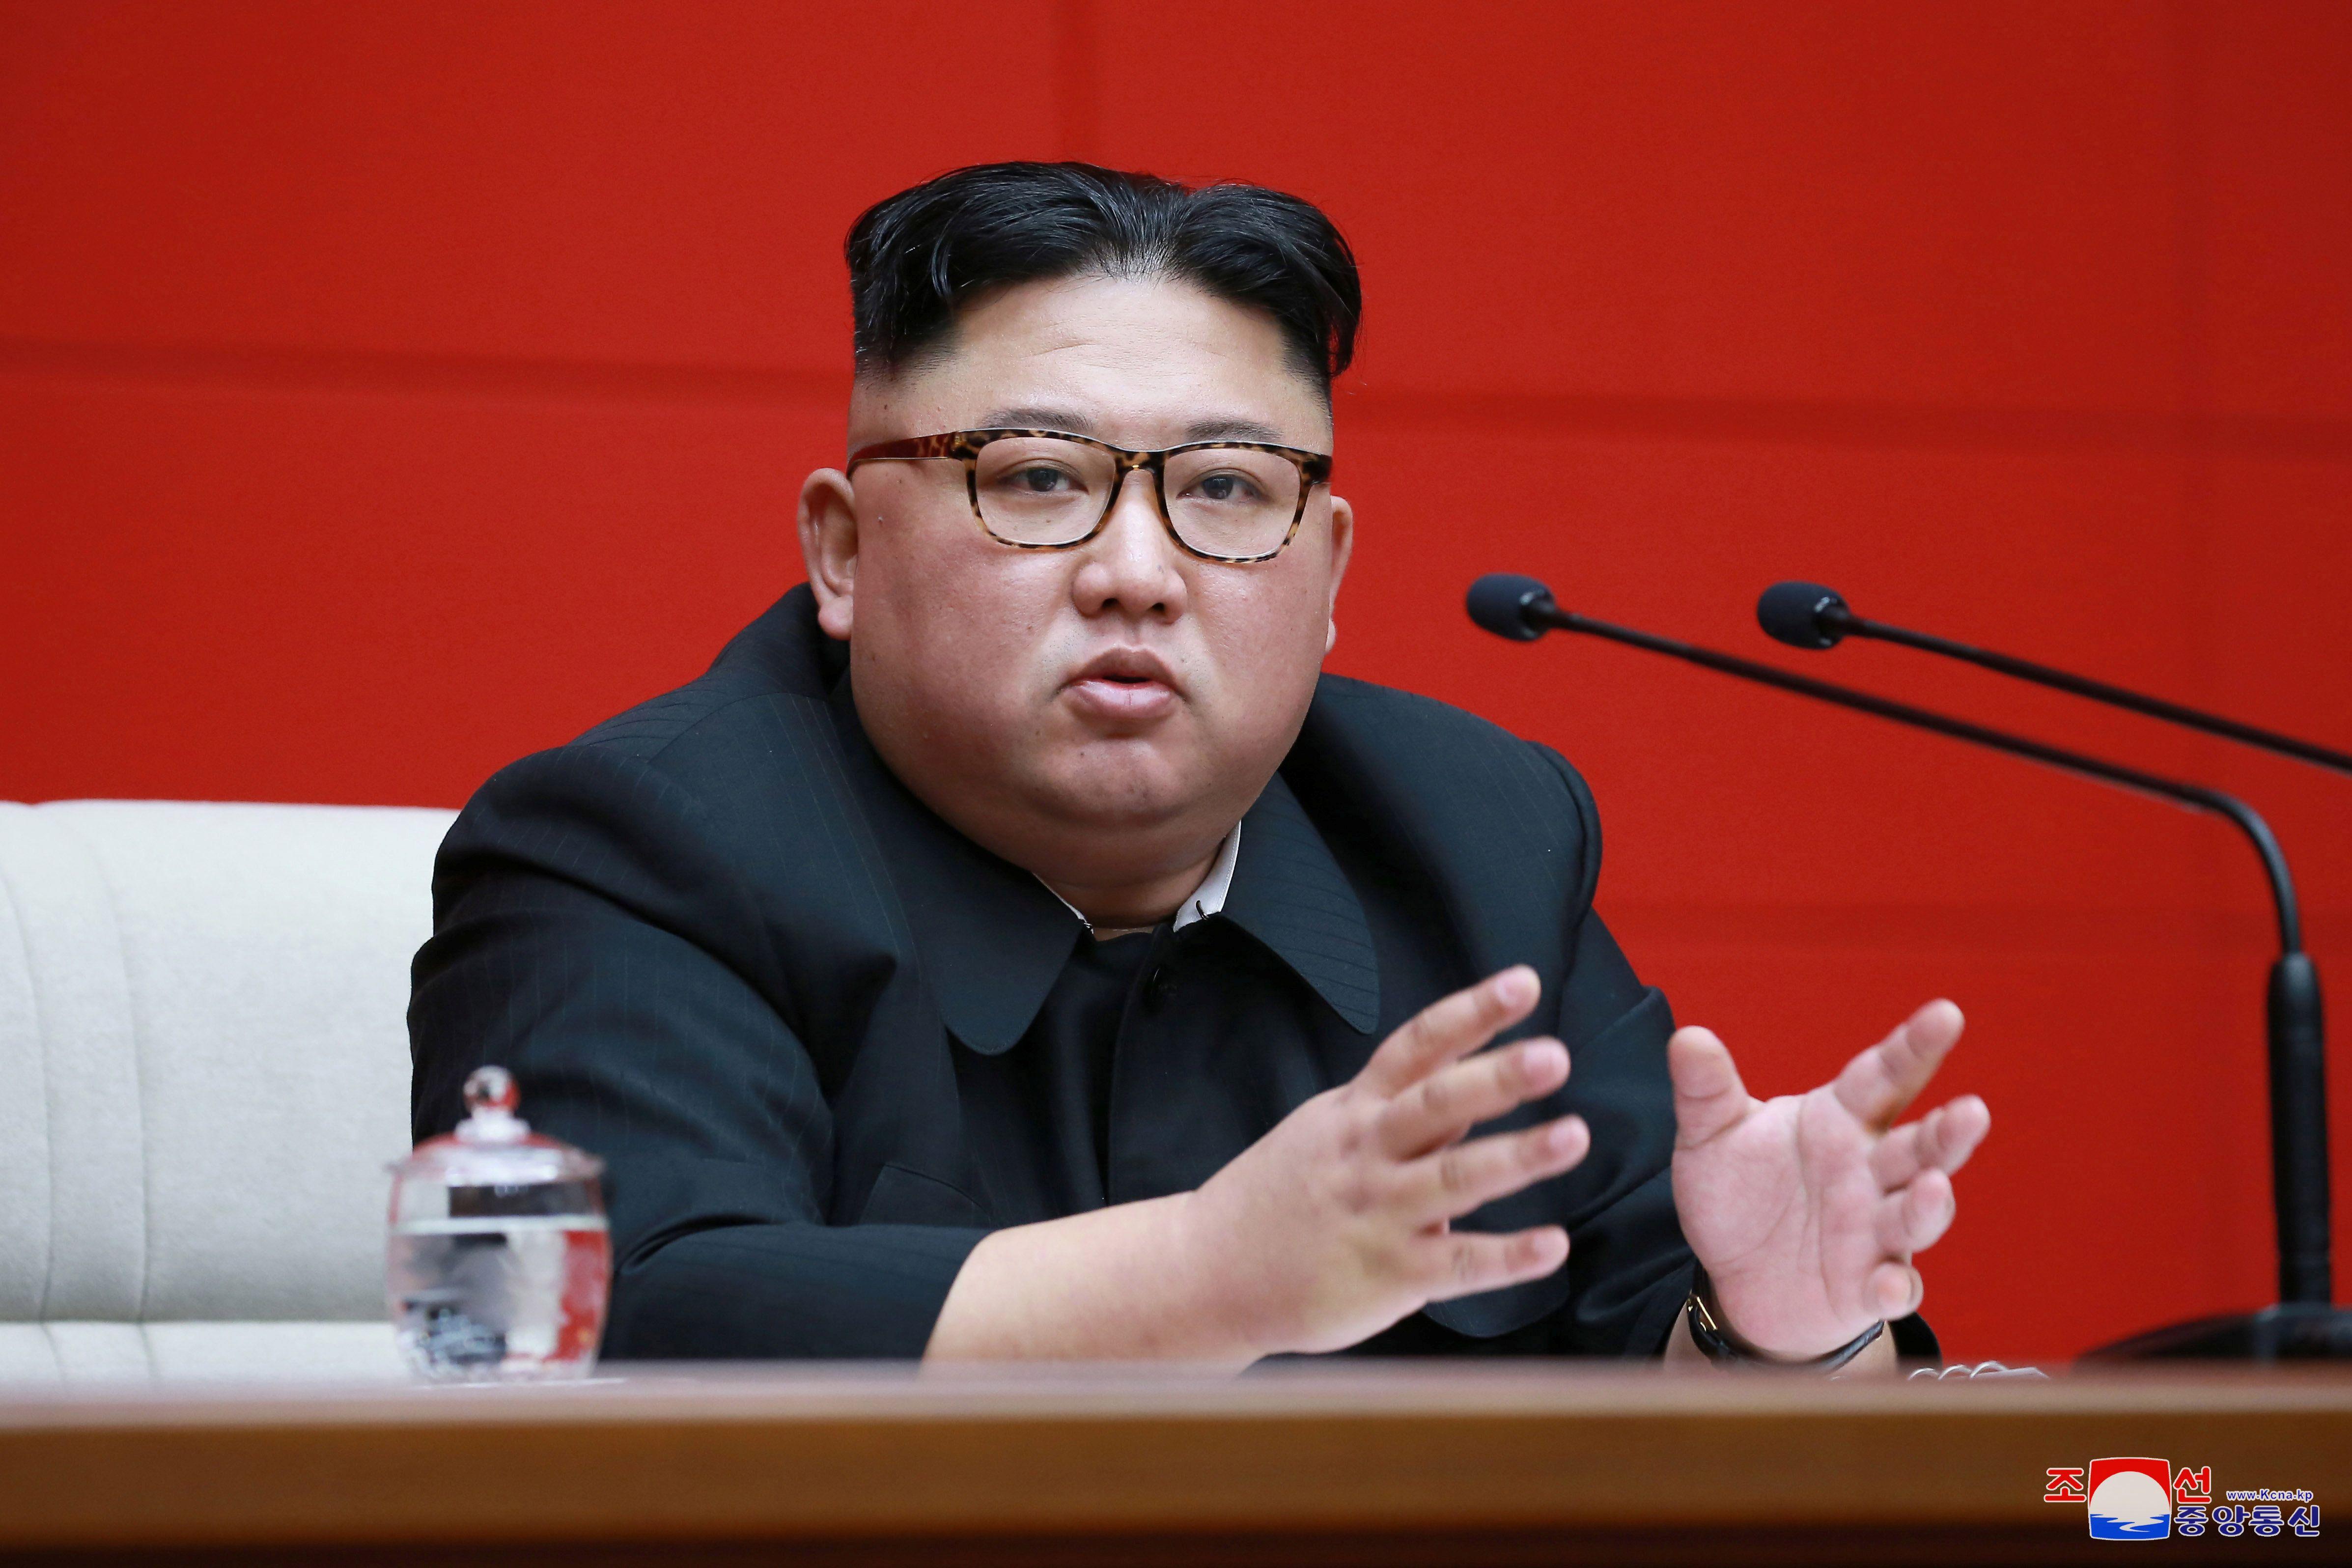 North Korea: Shaking Things Up